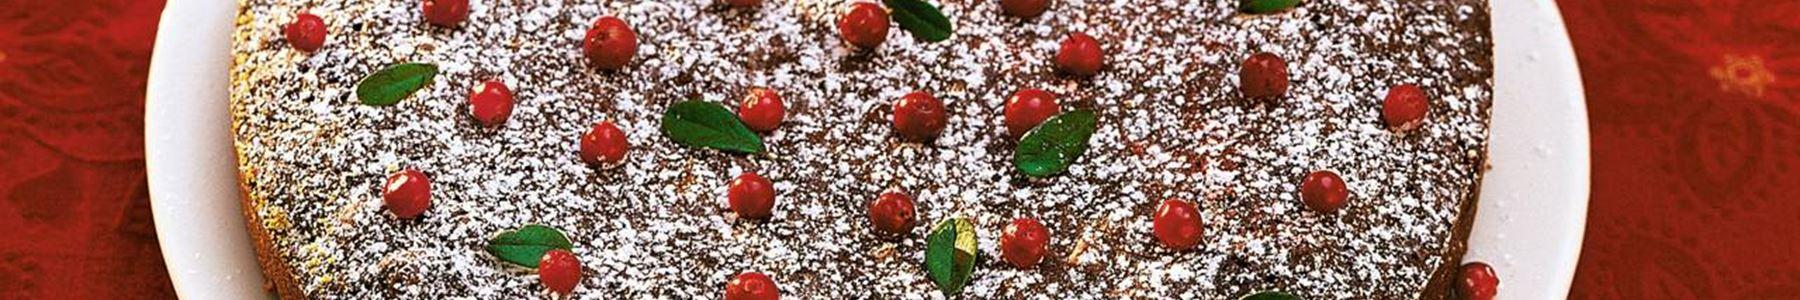 Russin + Mandel + Tårta